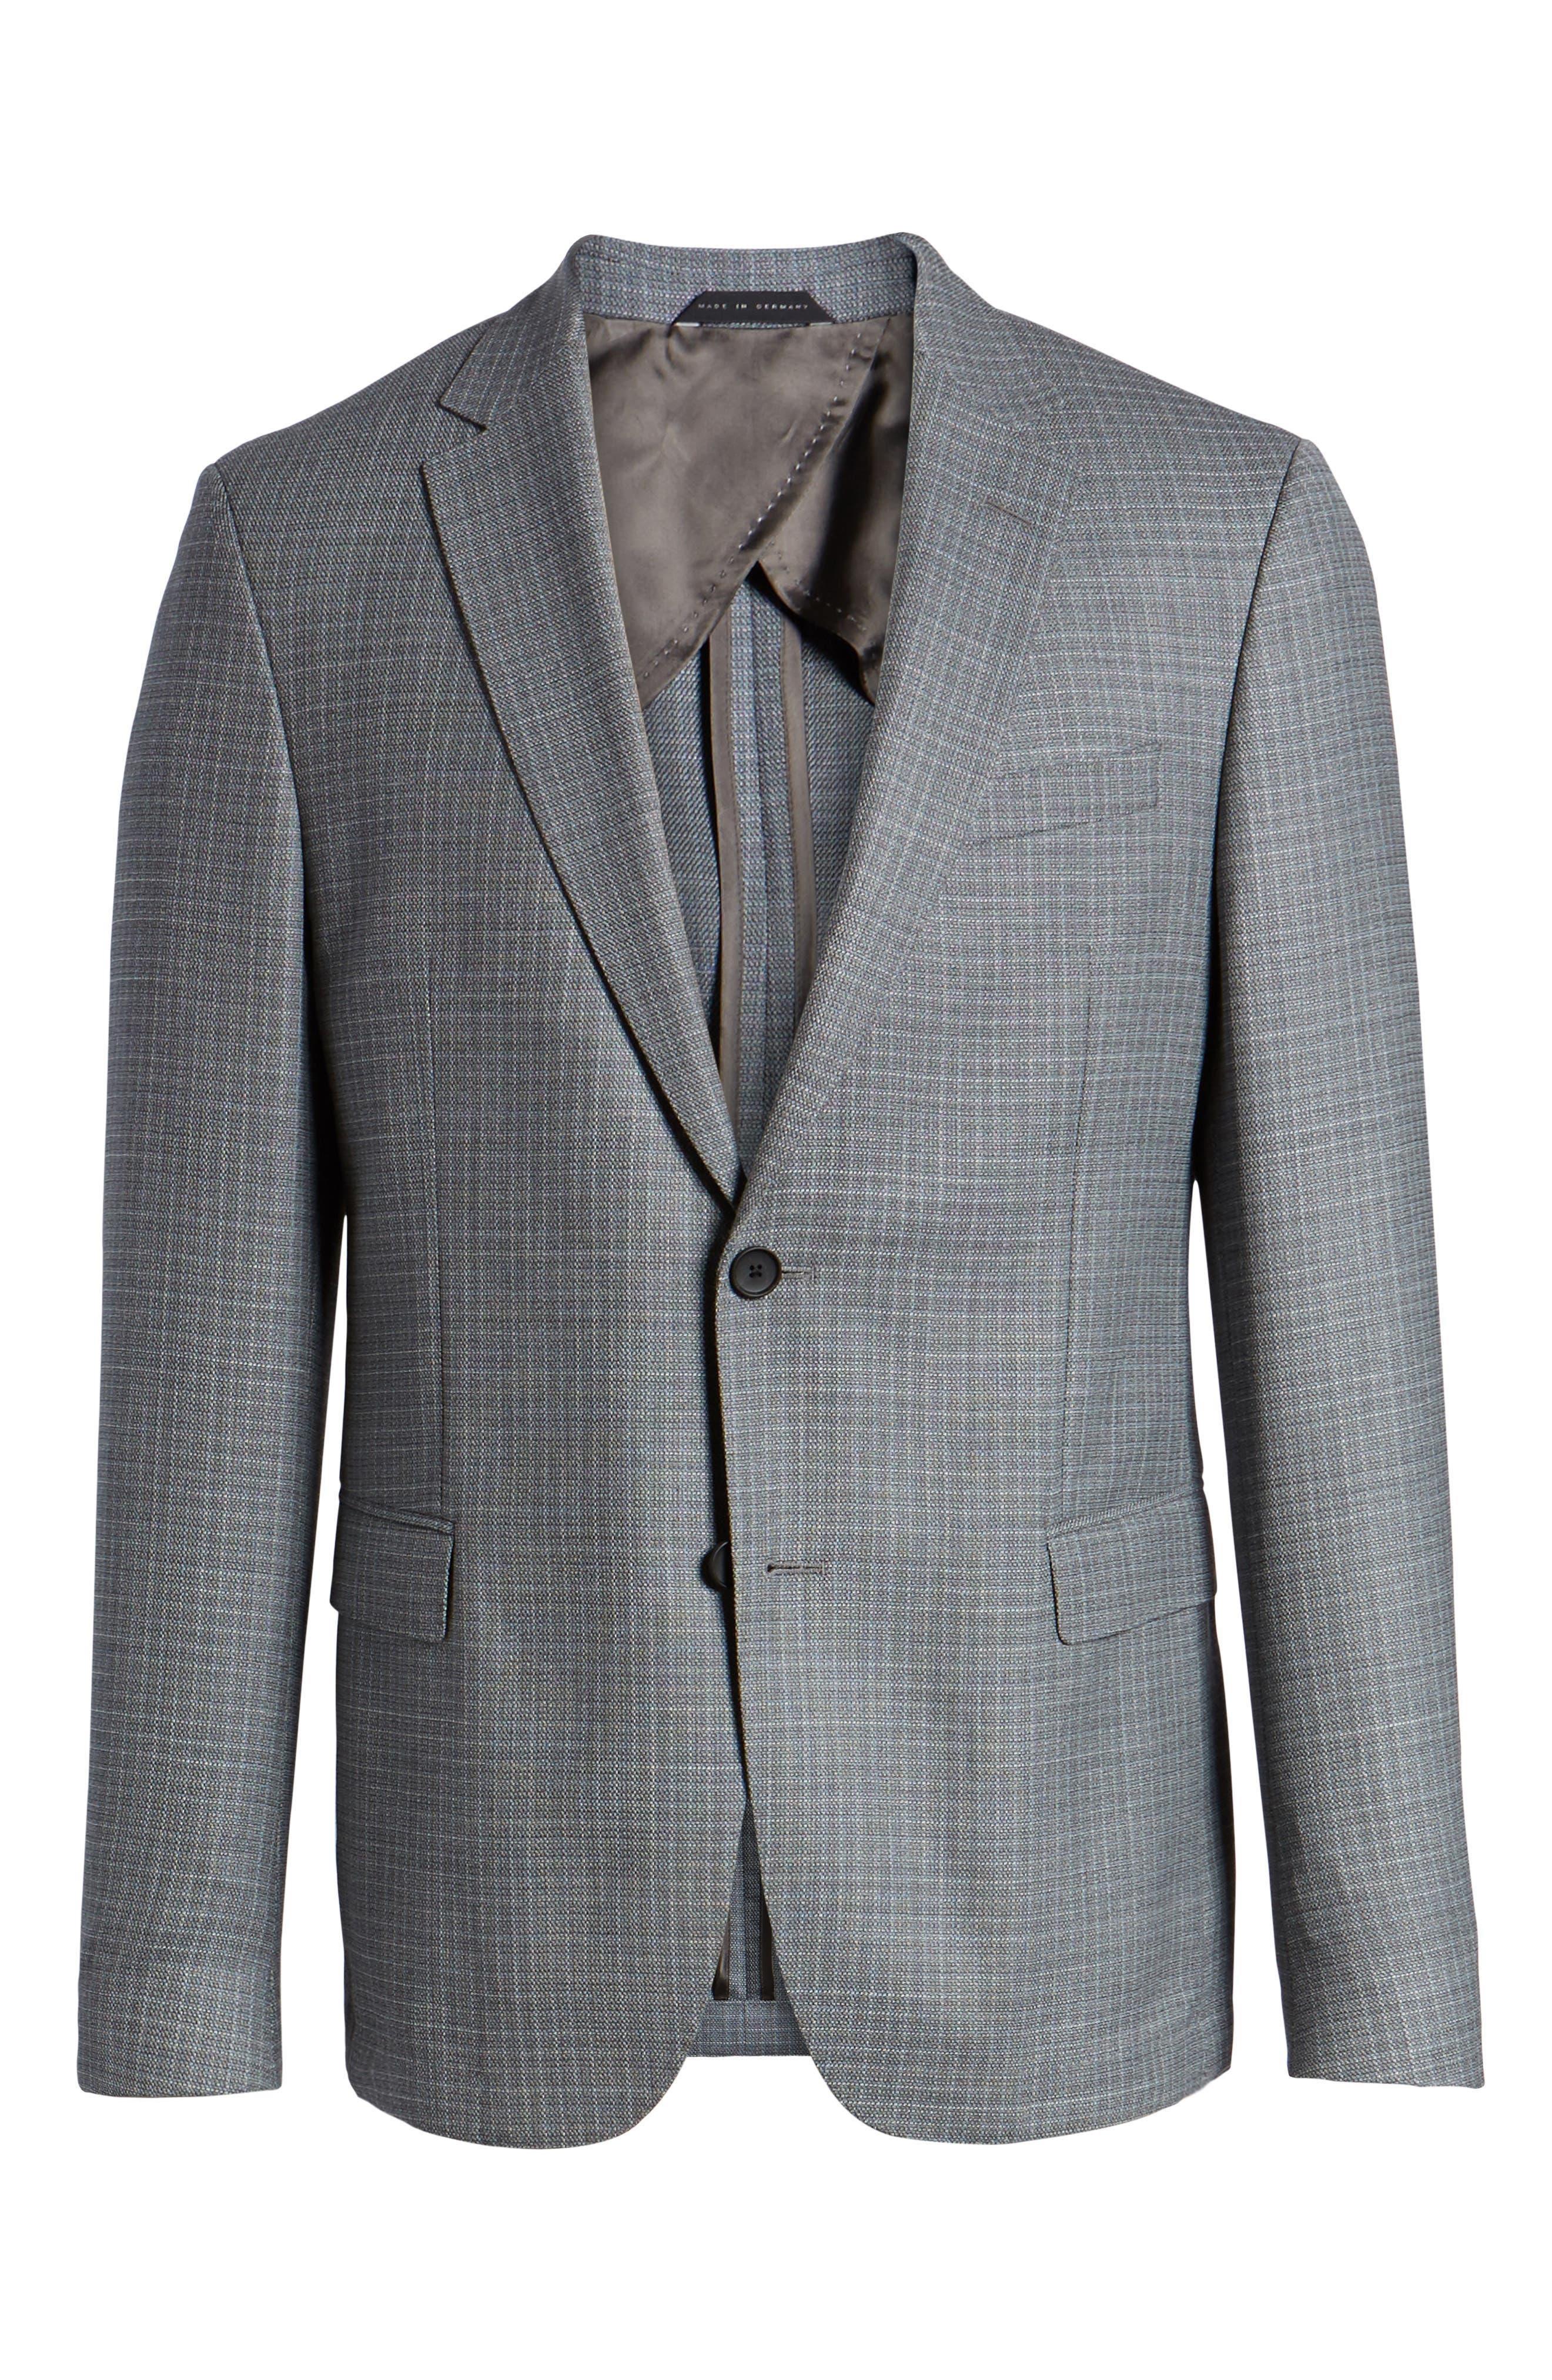 Nobis Trim Fit Wool Sport Coat,                             Alternate thumbnail 6, color,                             Medium Grey